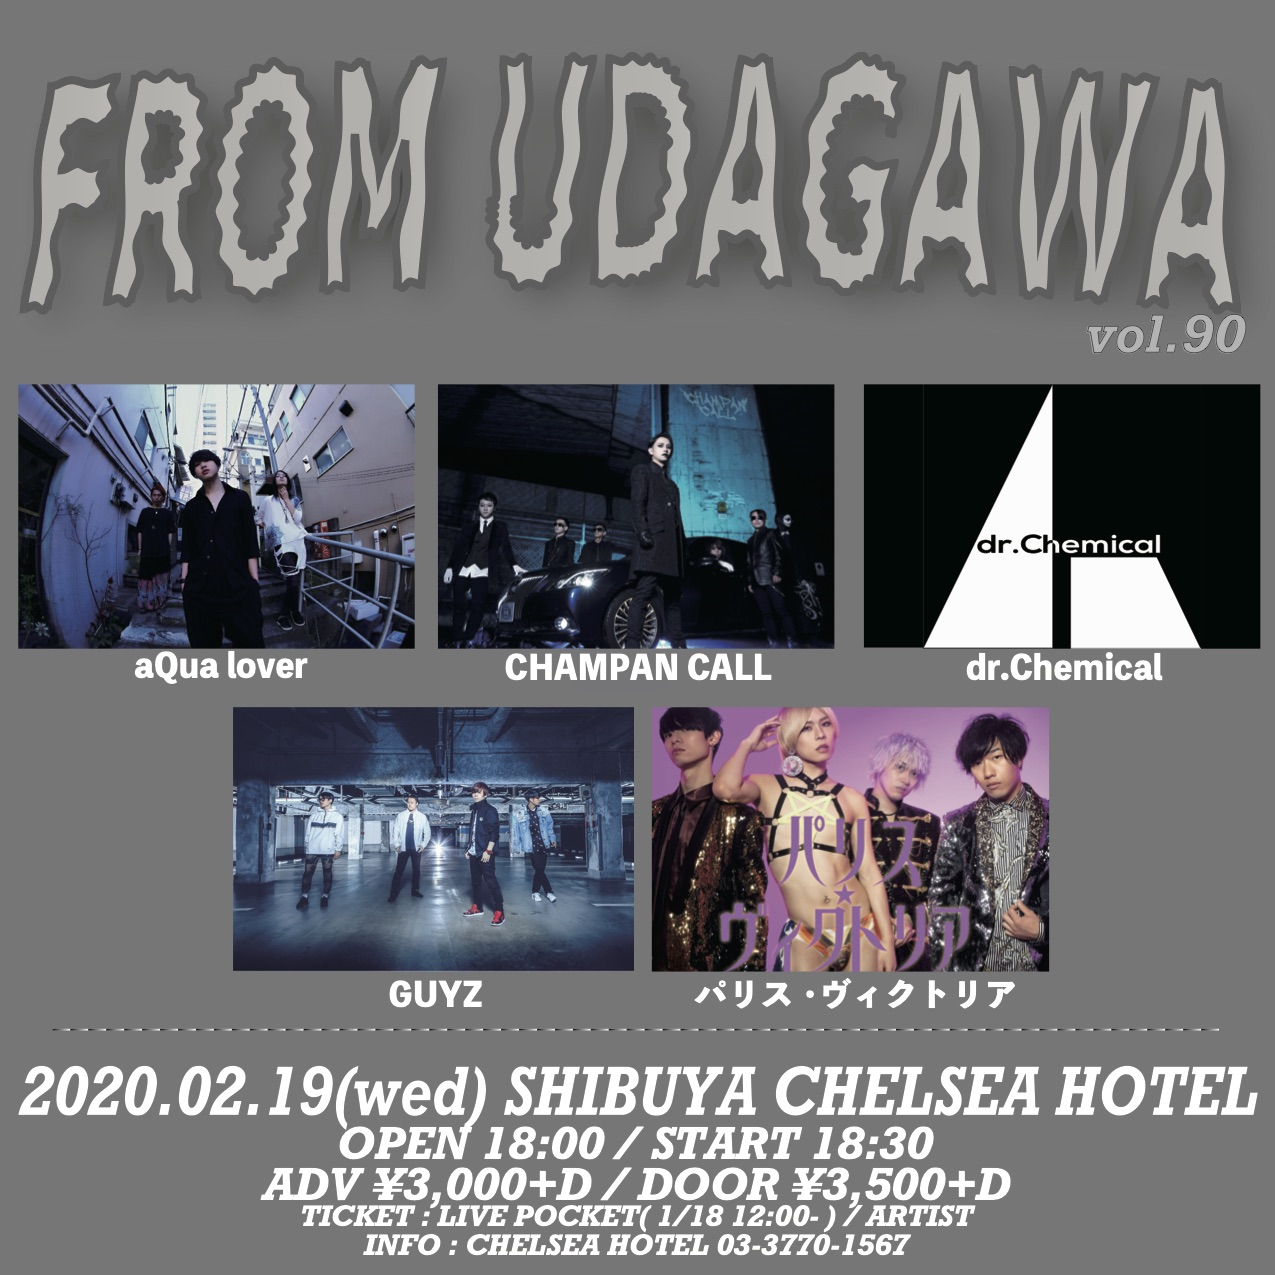 """FROM UDAGAWA""vol.90"